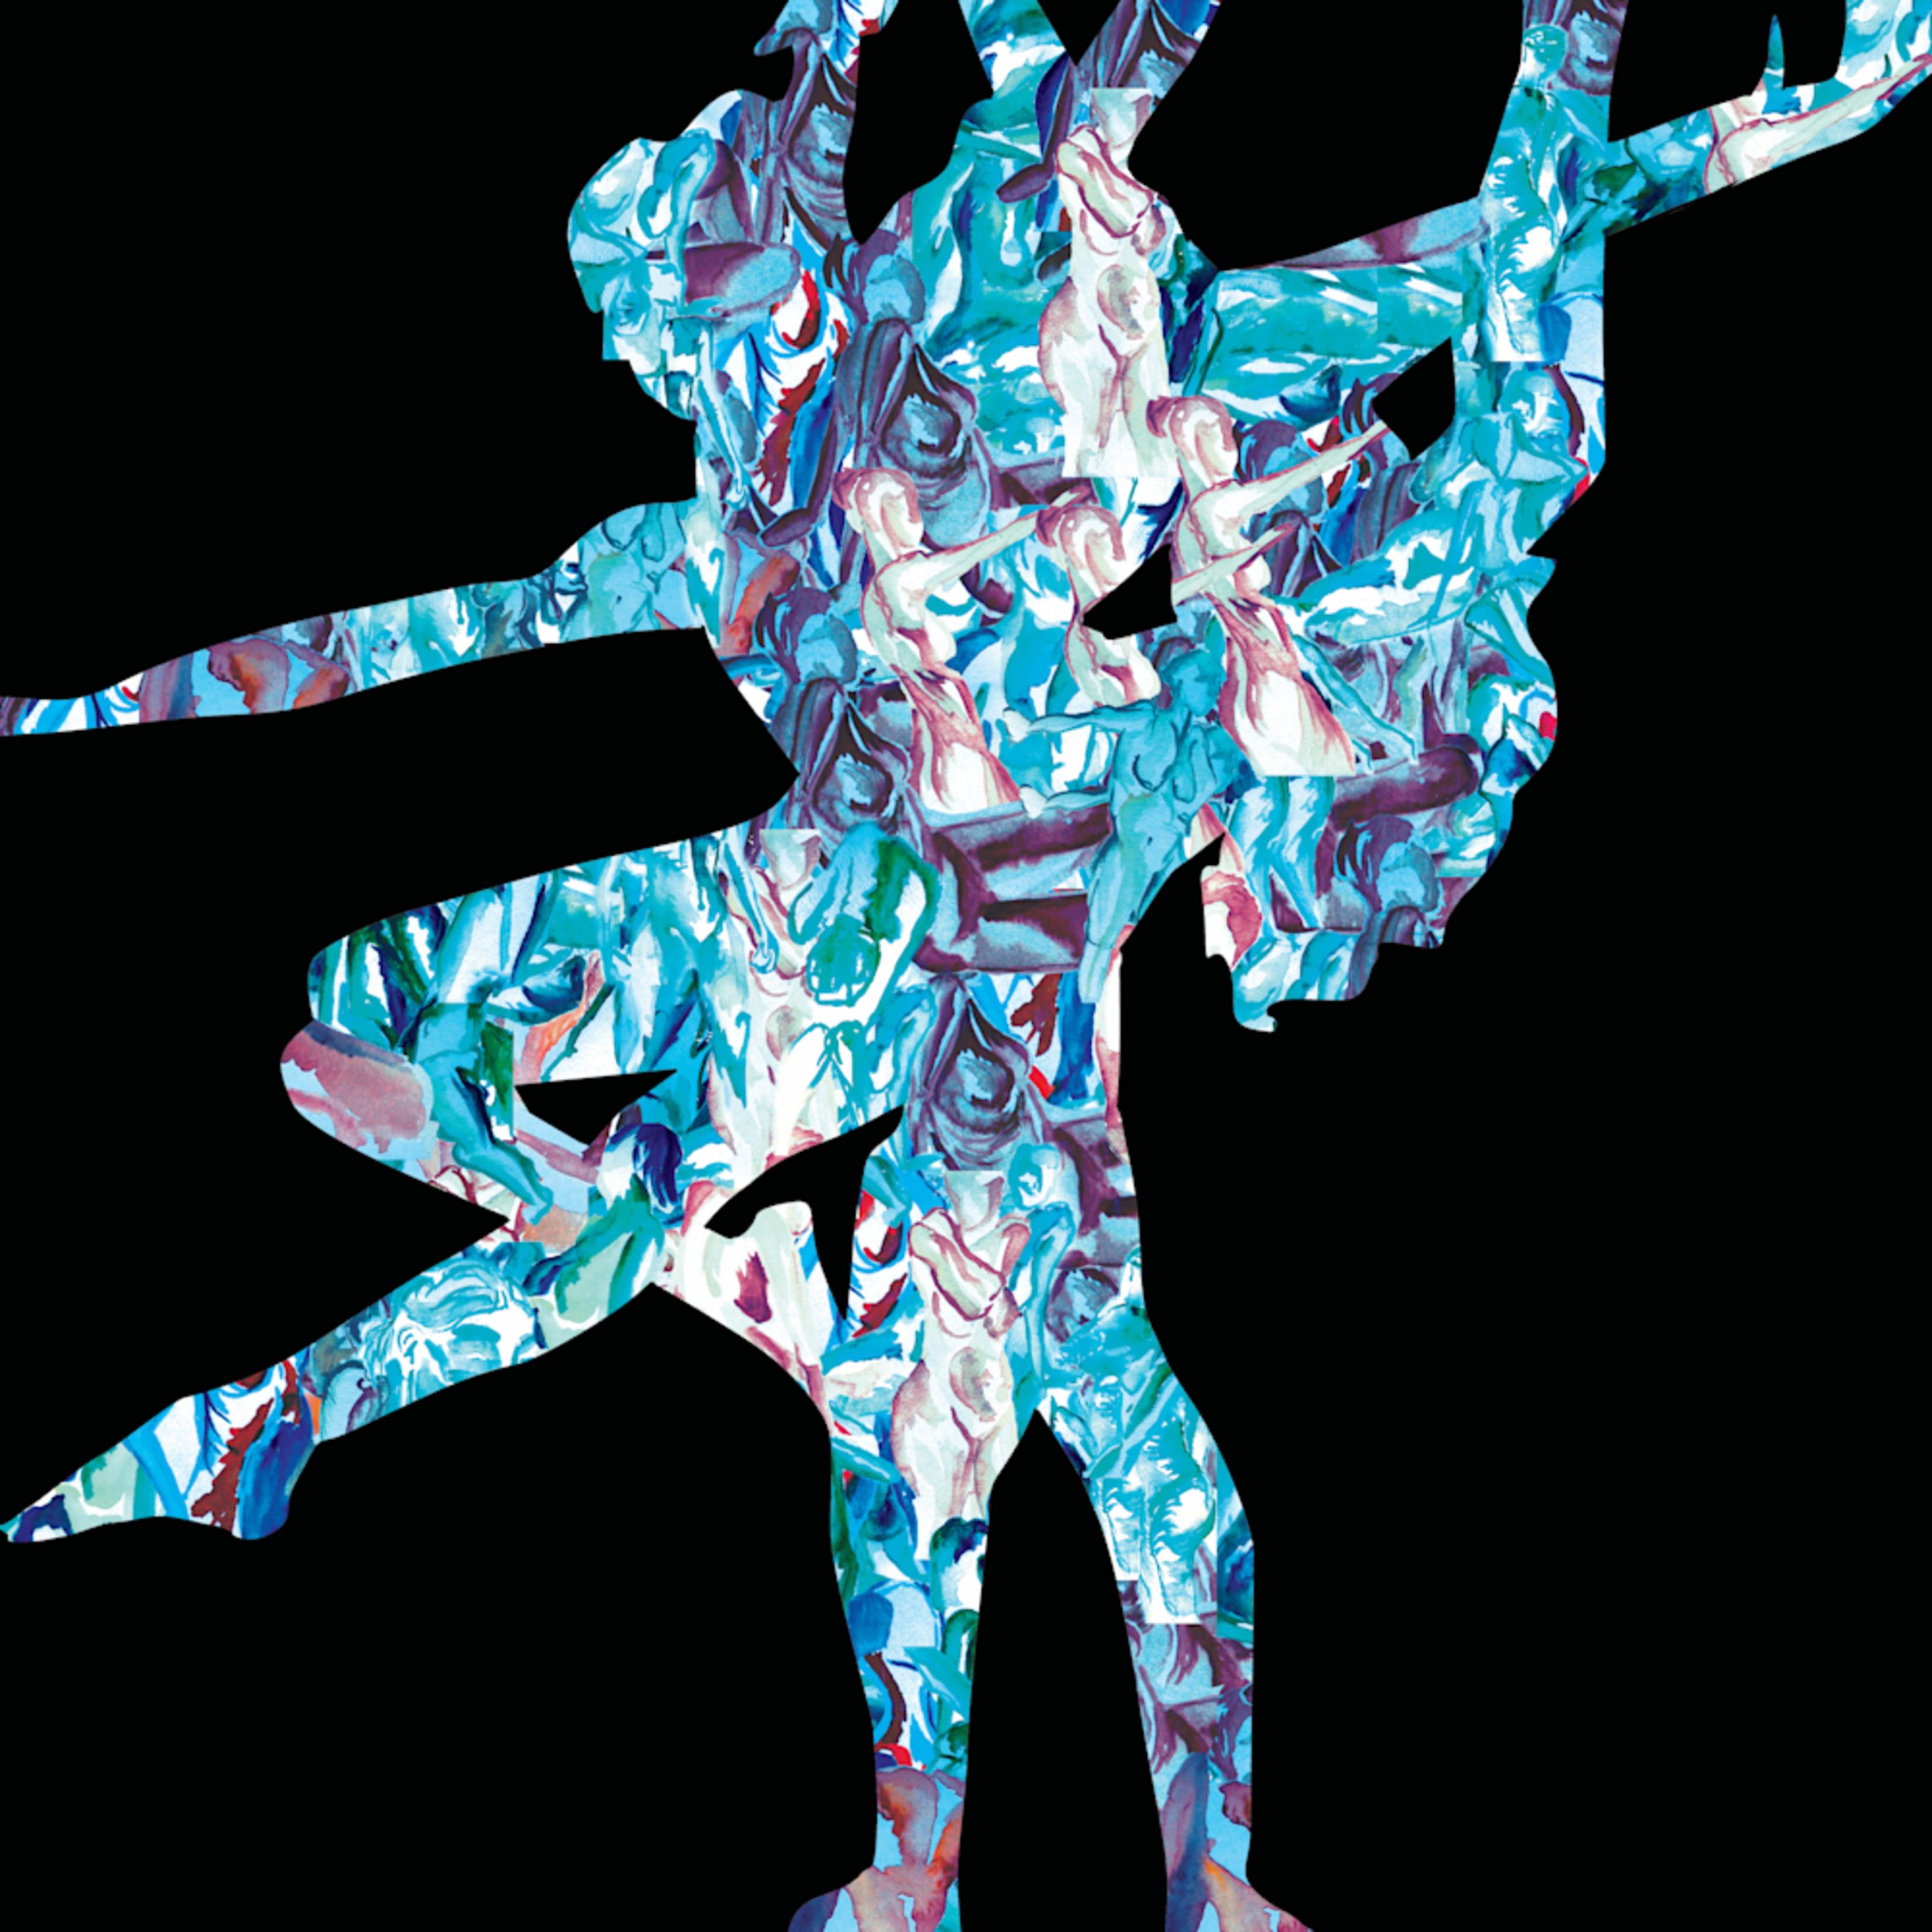 Persona 6 2019 merged hcjrtq